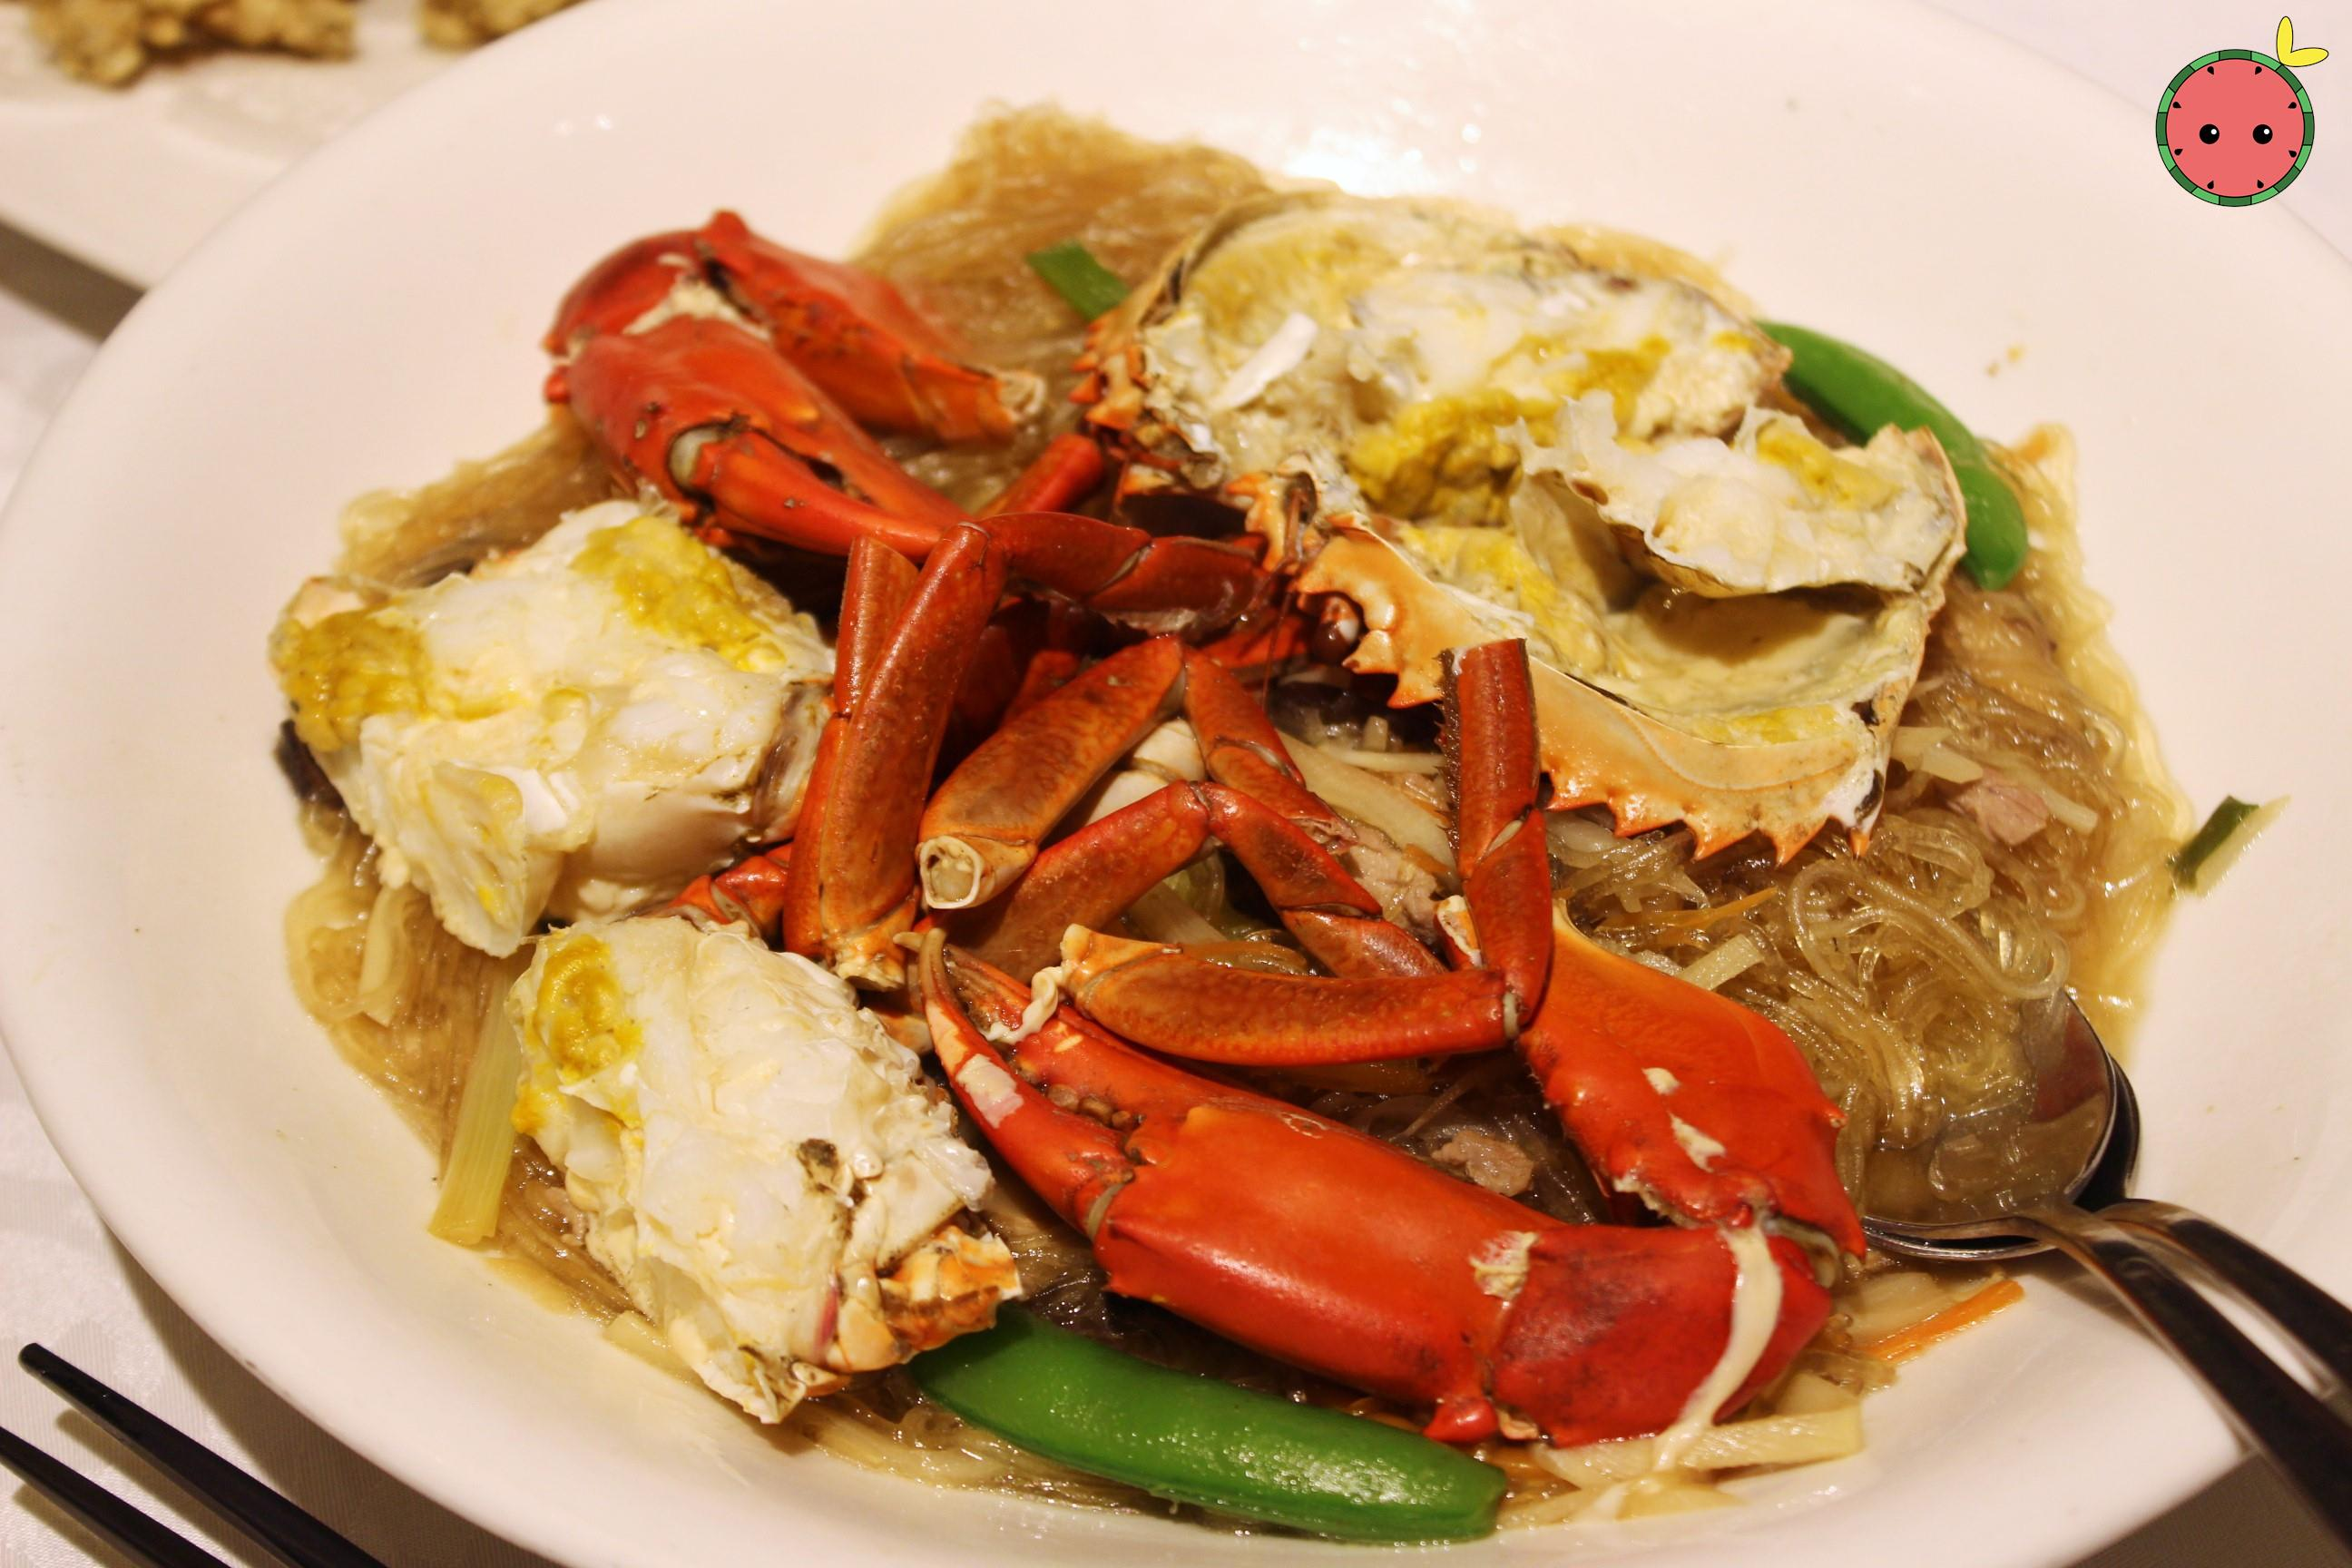 Wok-Seared Fresh Crab on Bean Thread Noodles 蟳仔冬粉